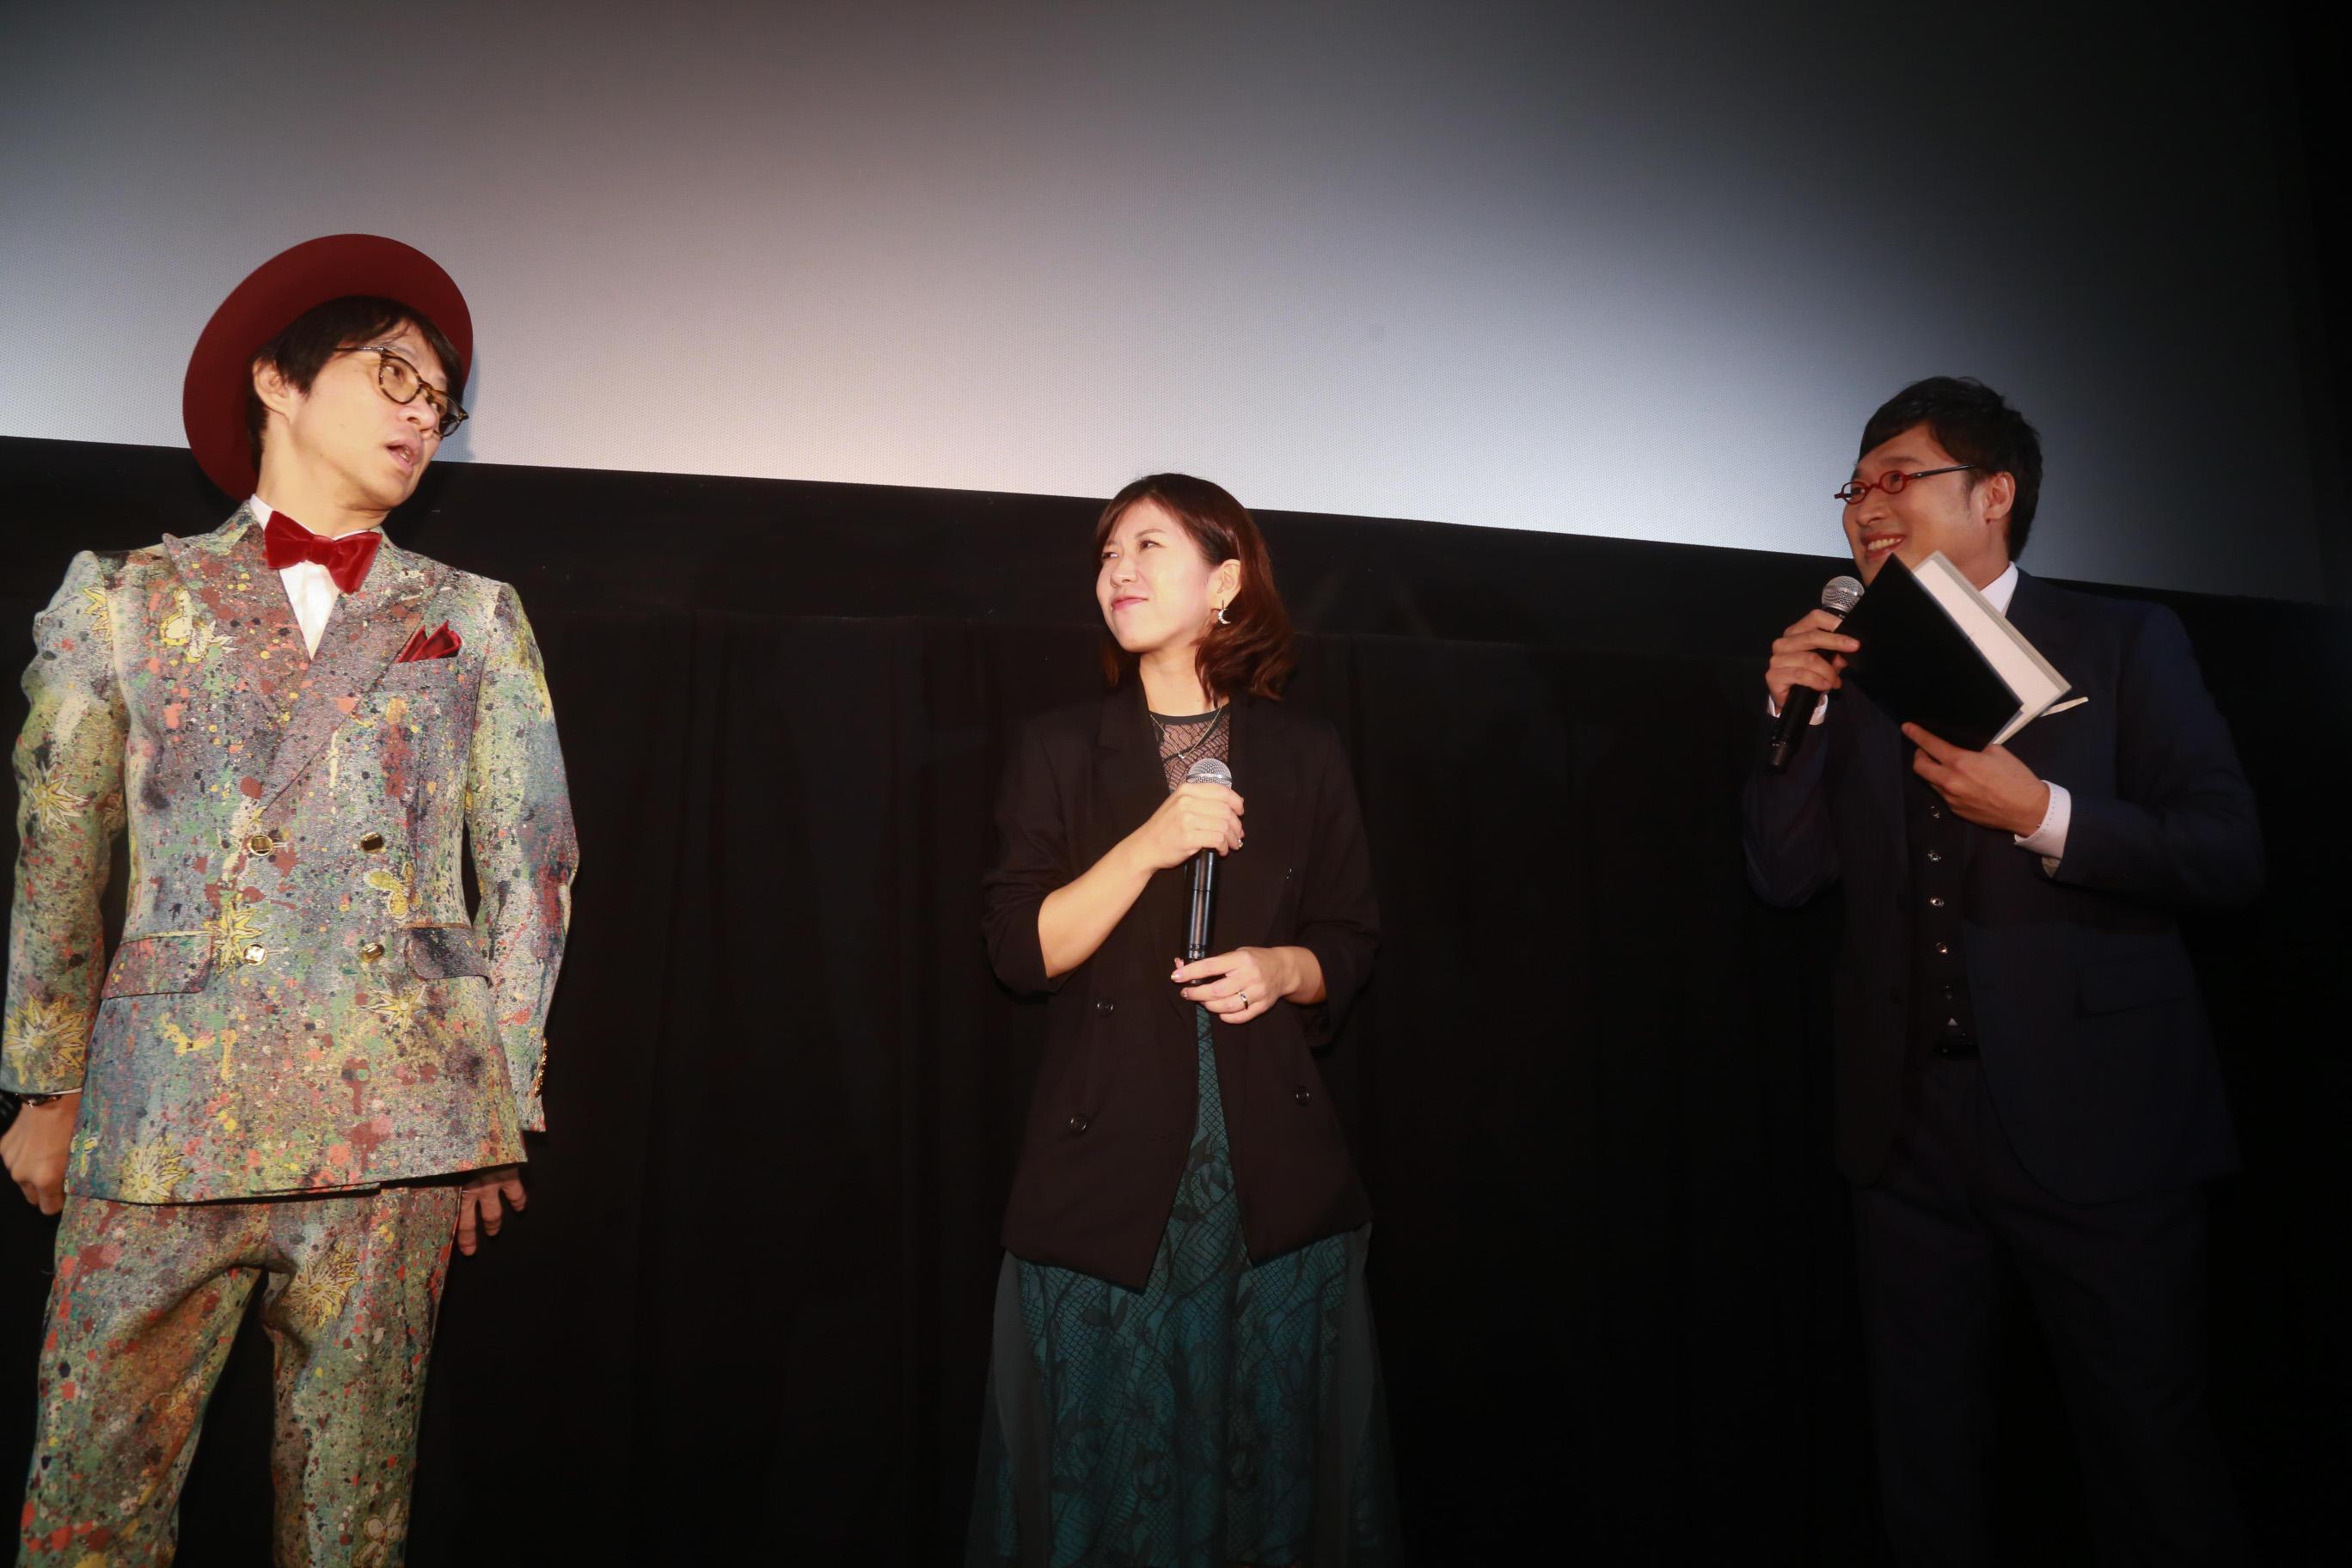 http://news.yoshimoto.co.jp/20181104142009-a22579fdba9960f8bc7570f1bc4aed08c3a194b5.jpg